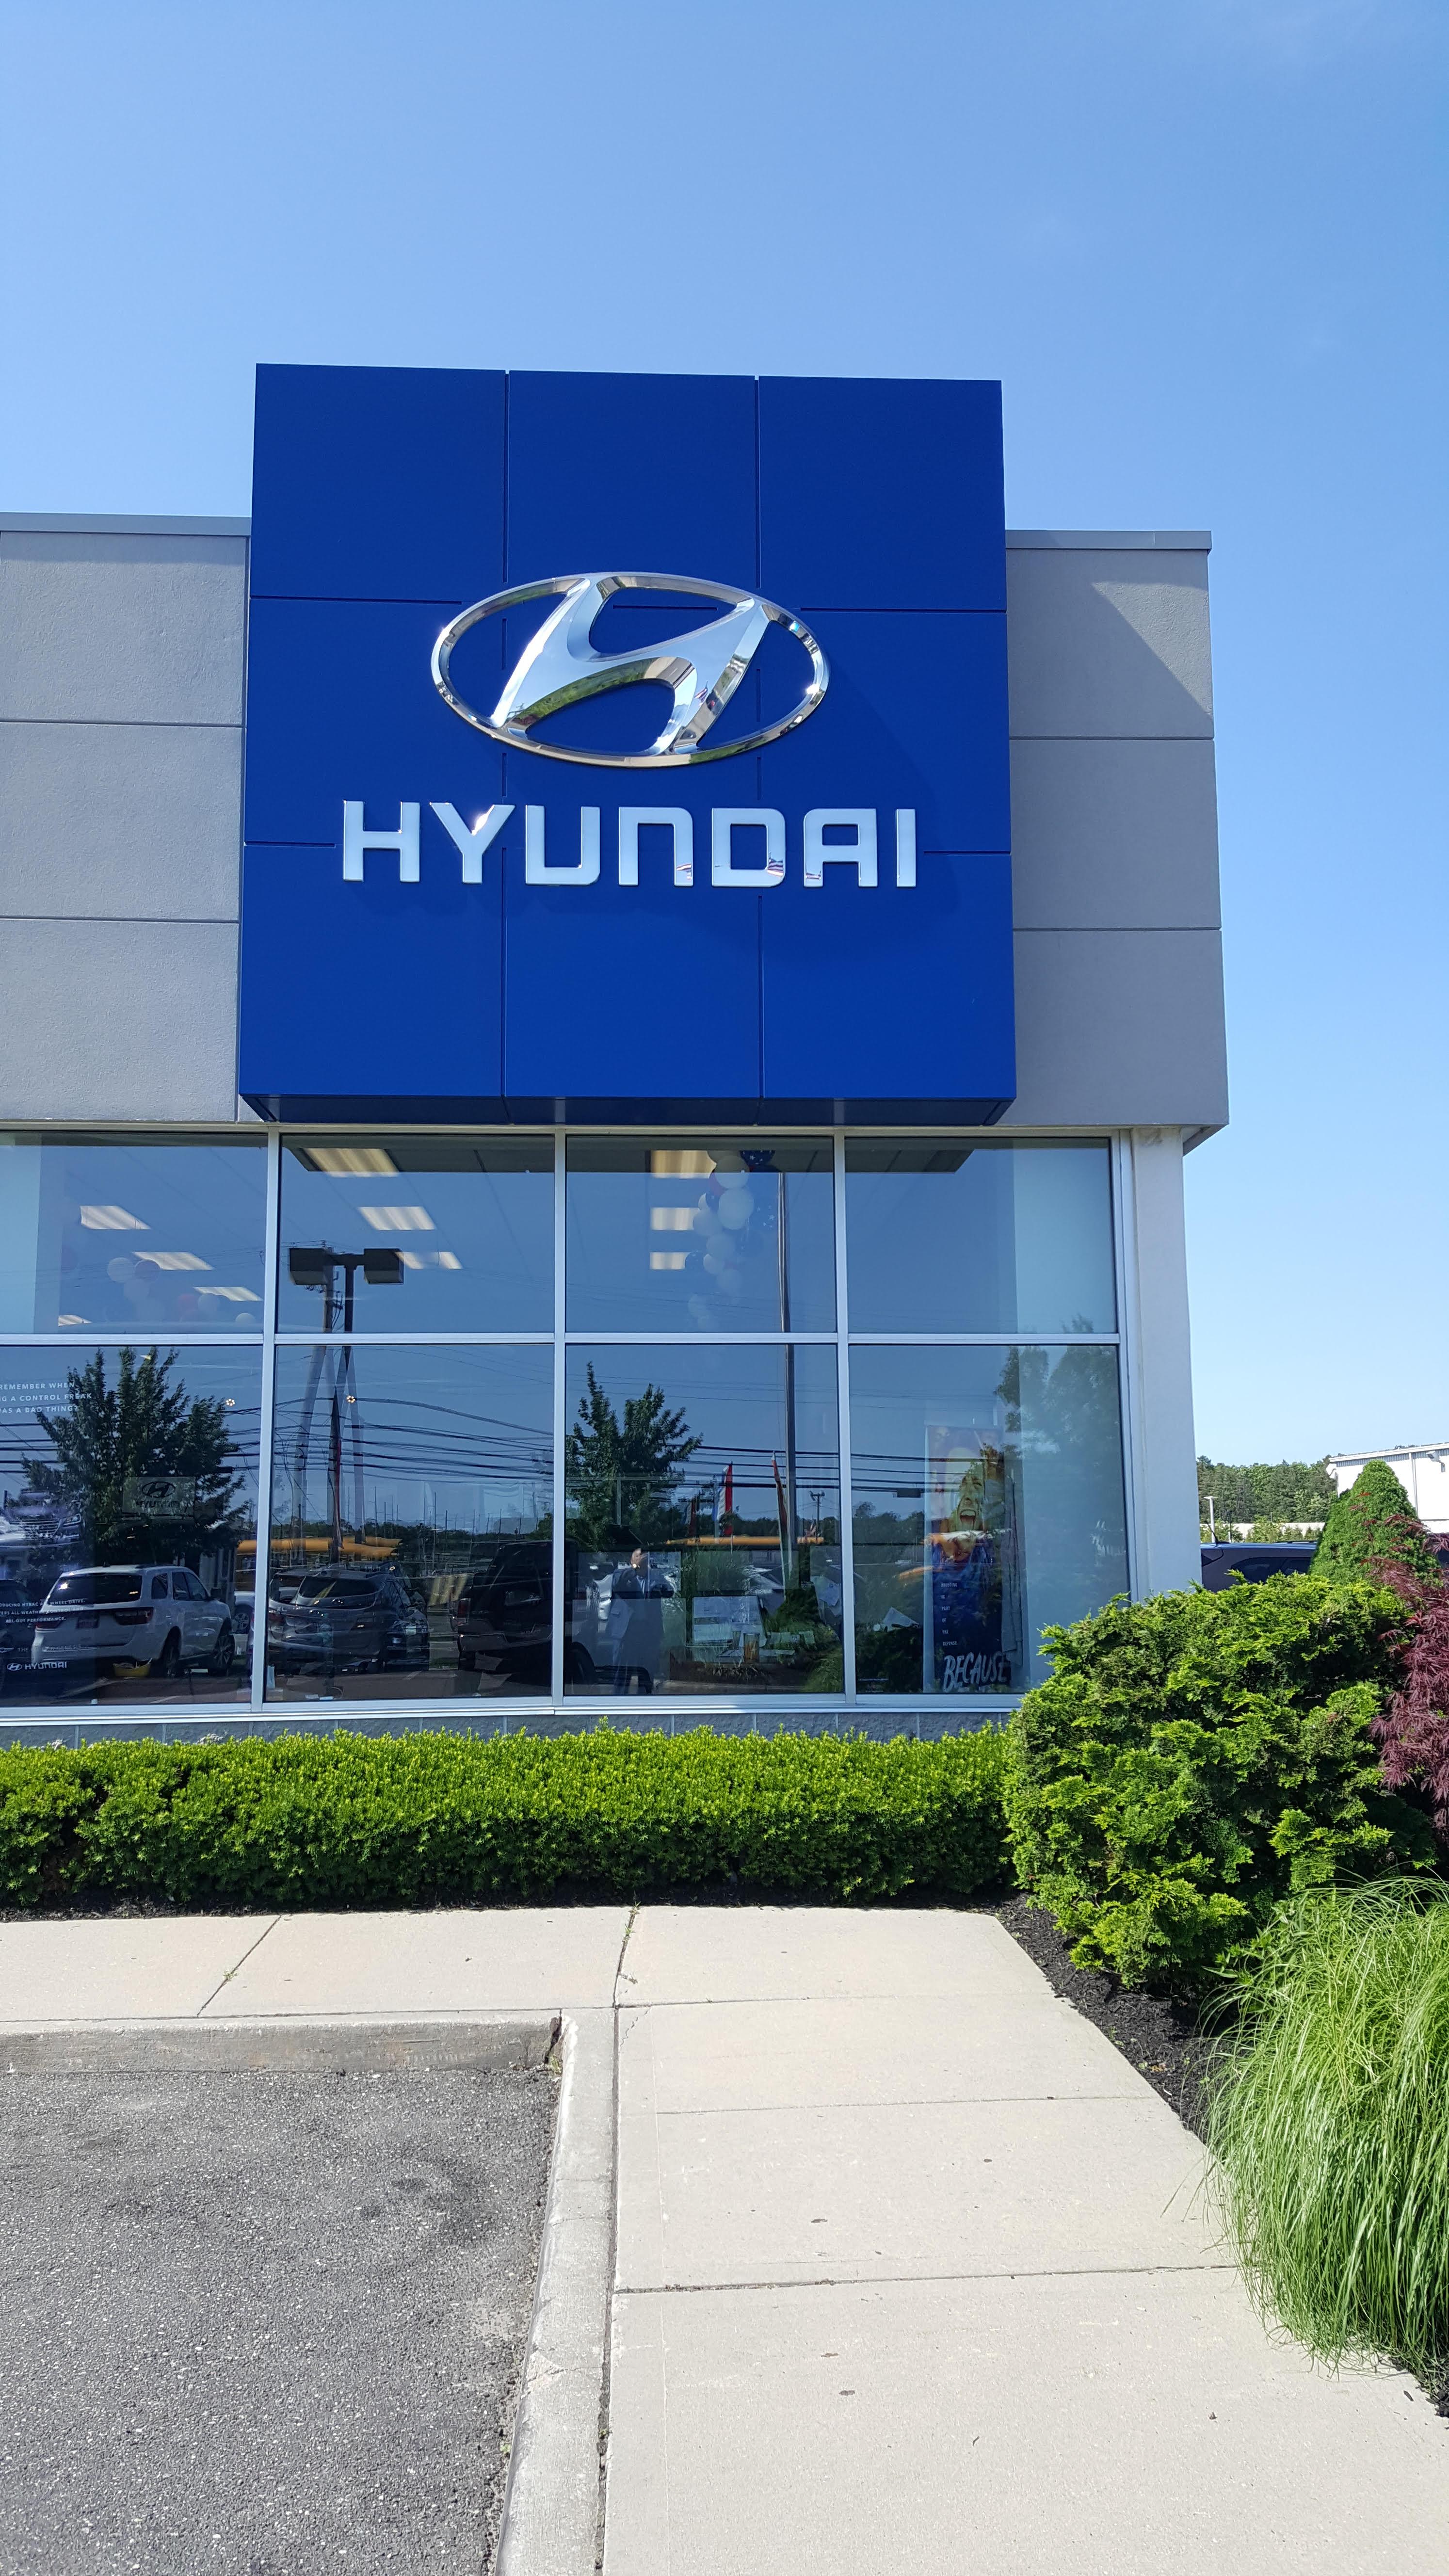 Hyundai coupons